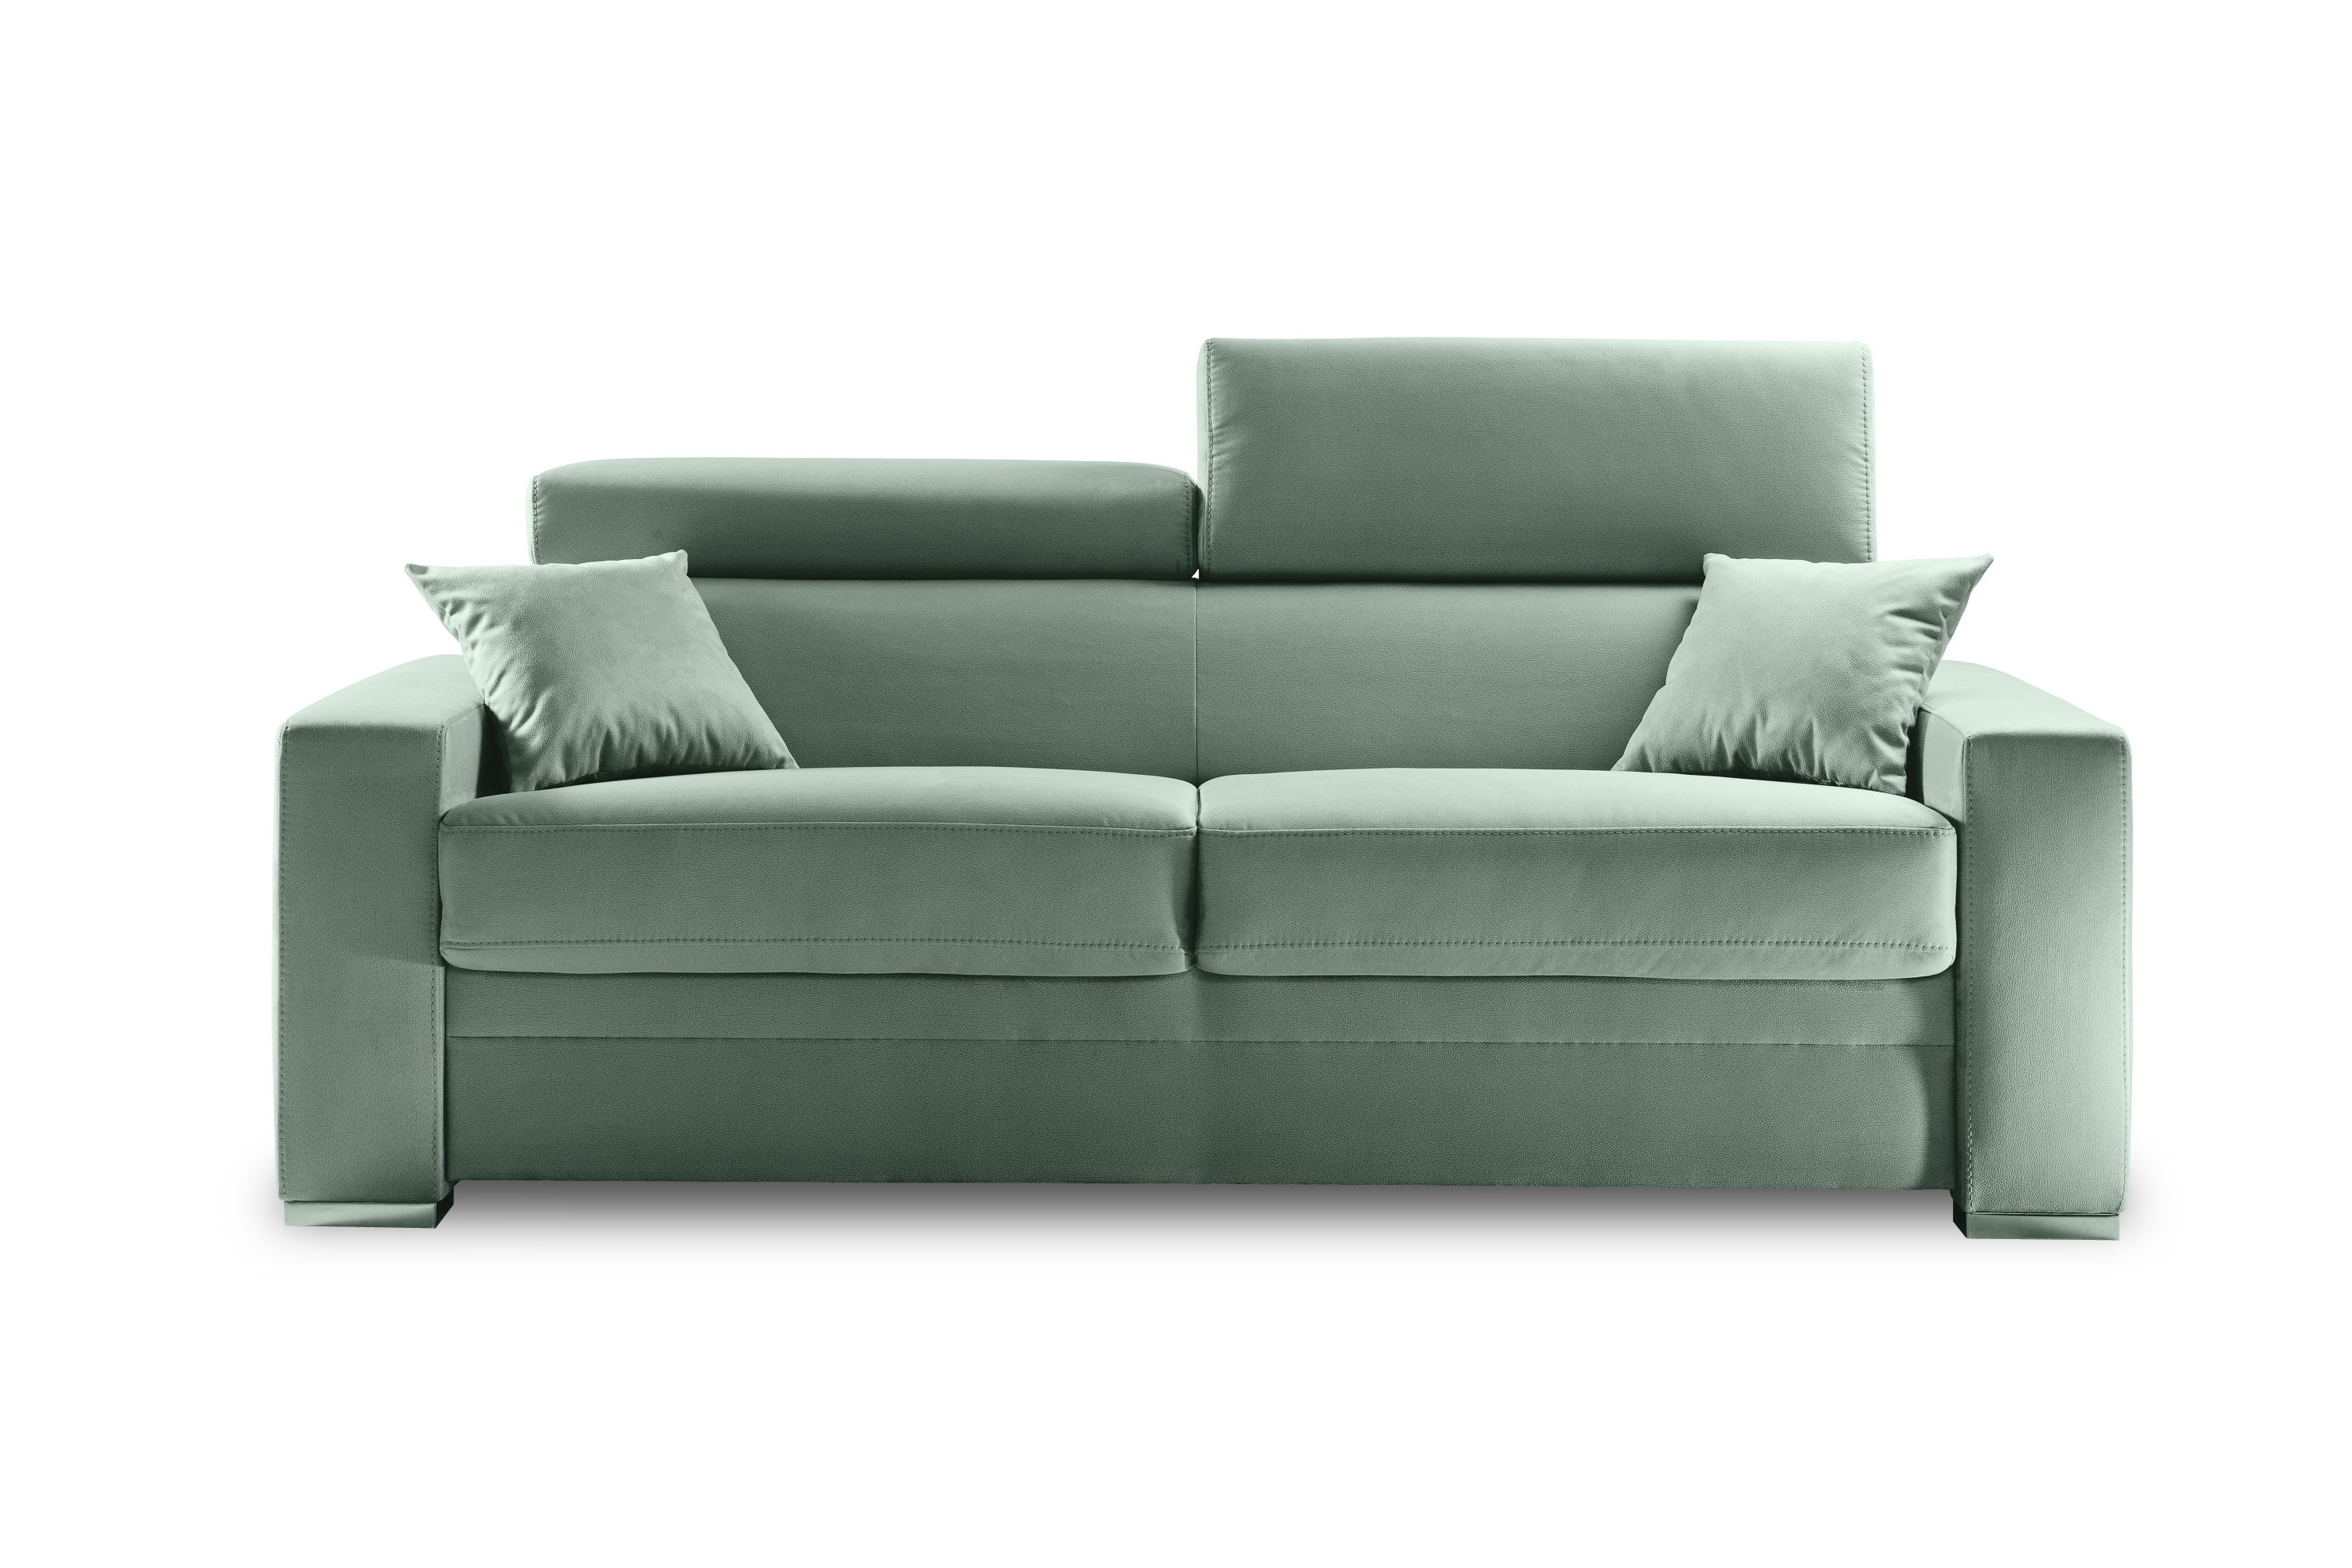 canap diva rapido aranda canap id es de d coration de maison eybj29abo7. Black Bedroom Furniture Sets. Home Design Ideas